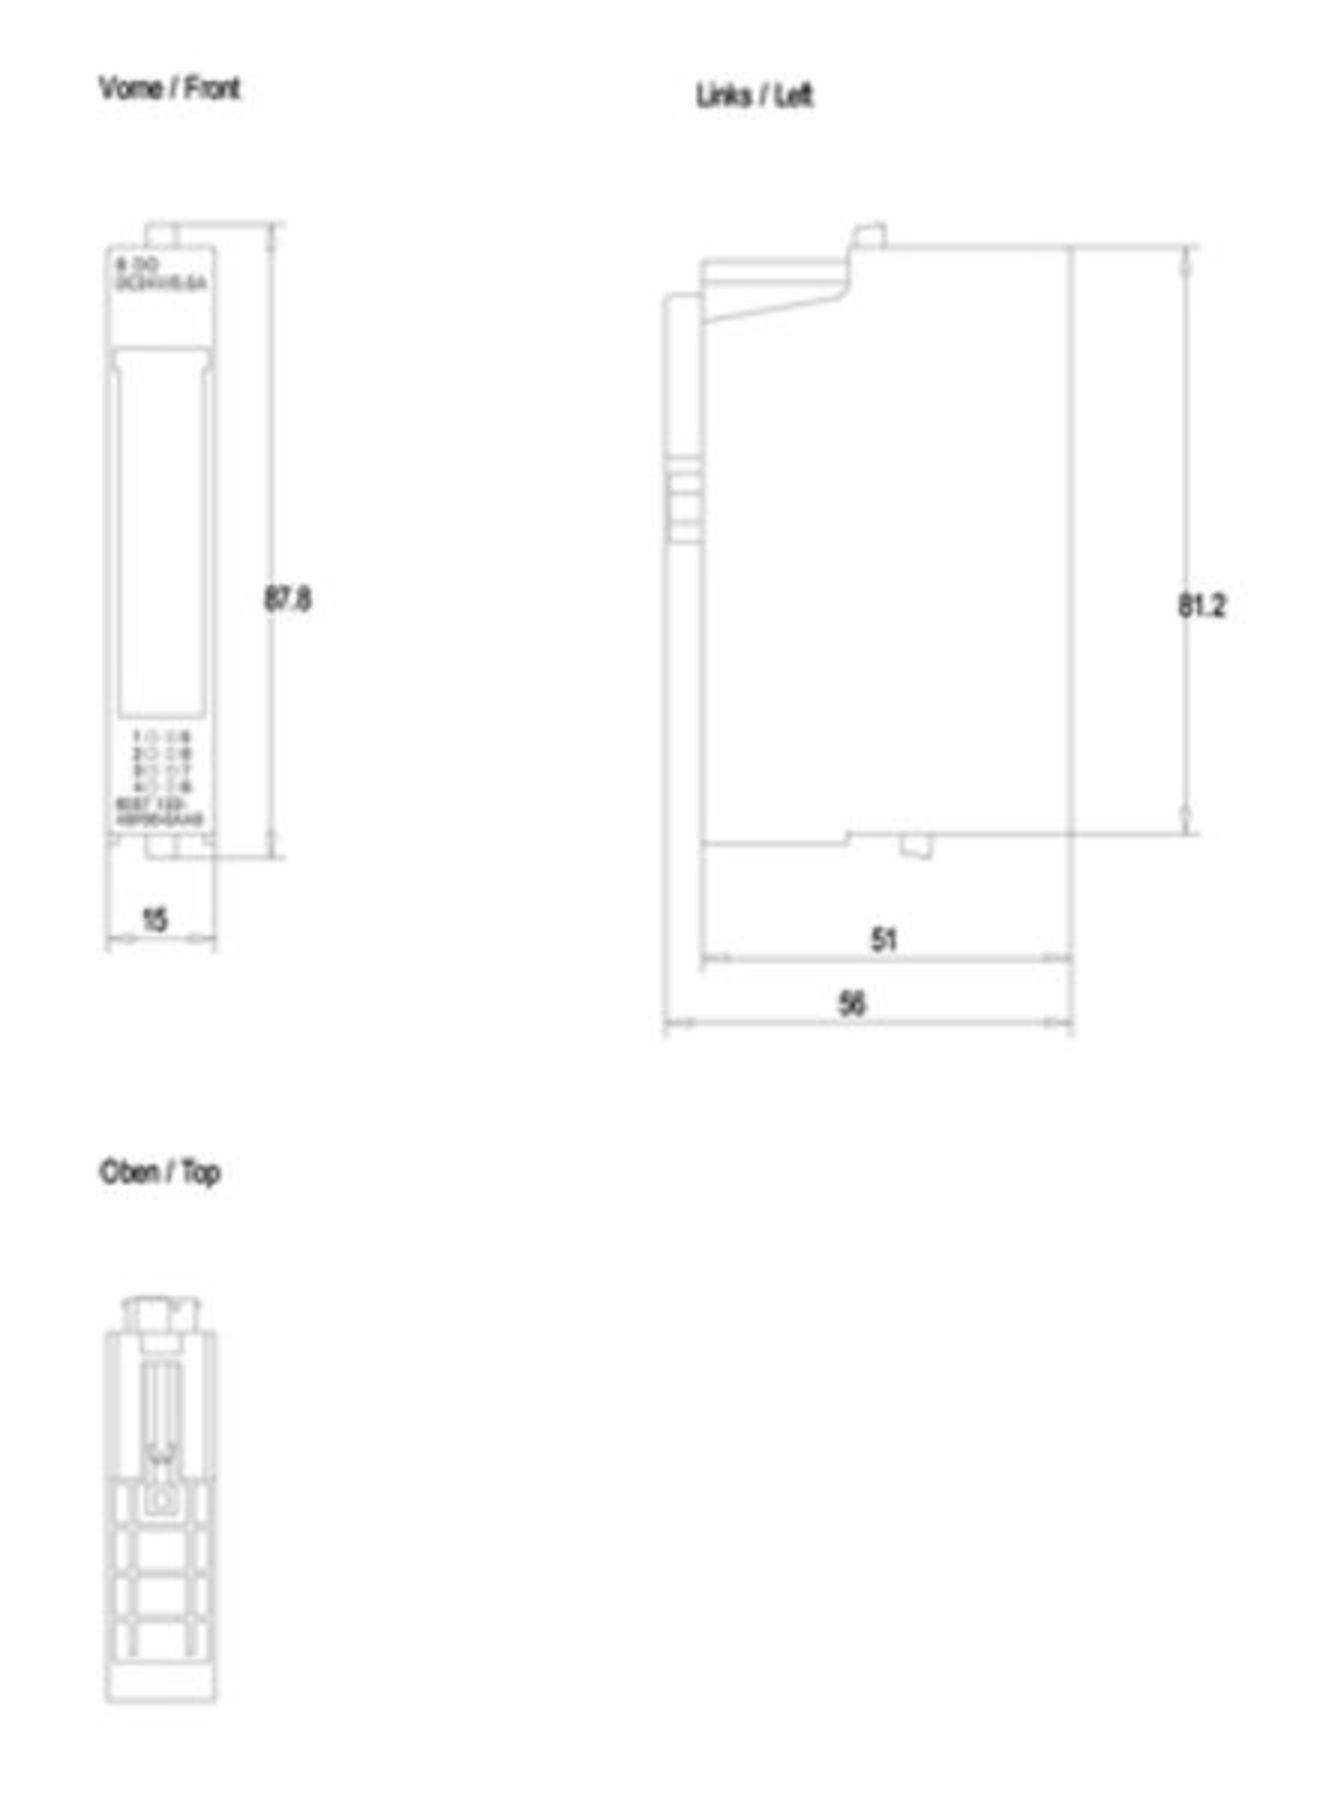 Siemens Simatic  6ES7 132-4BF00-0AA0  Digital Output Module